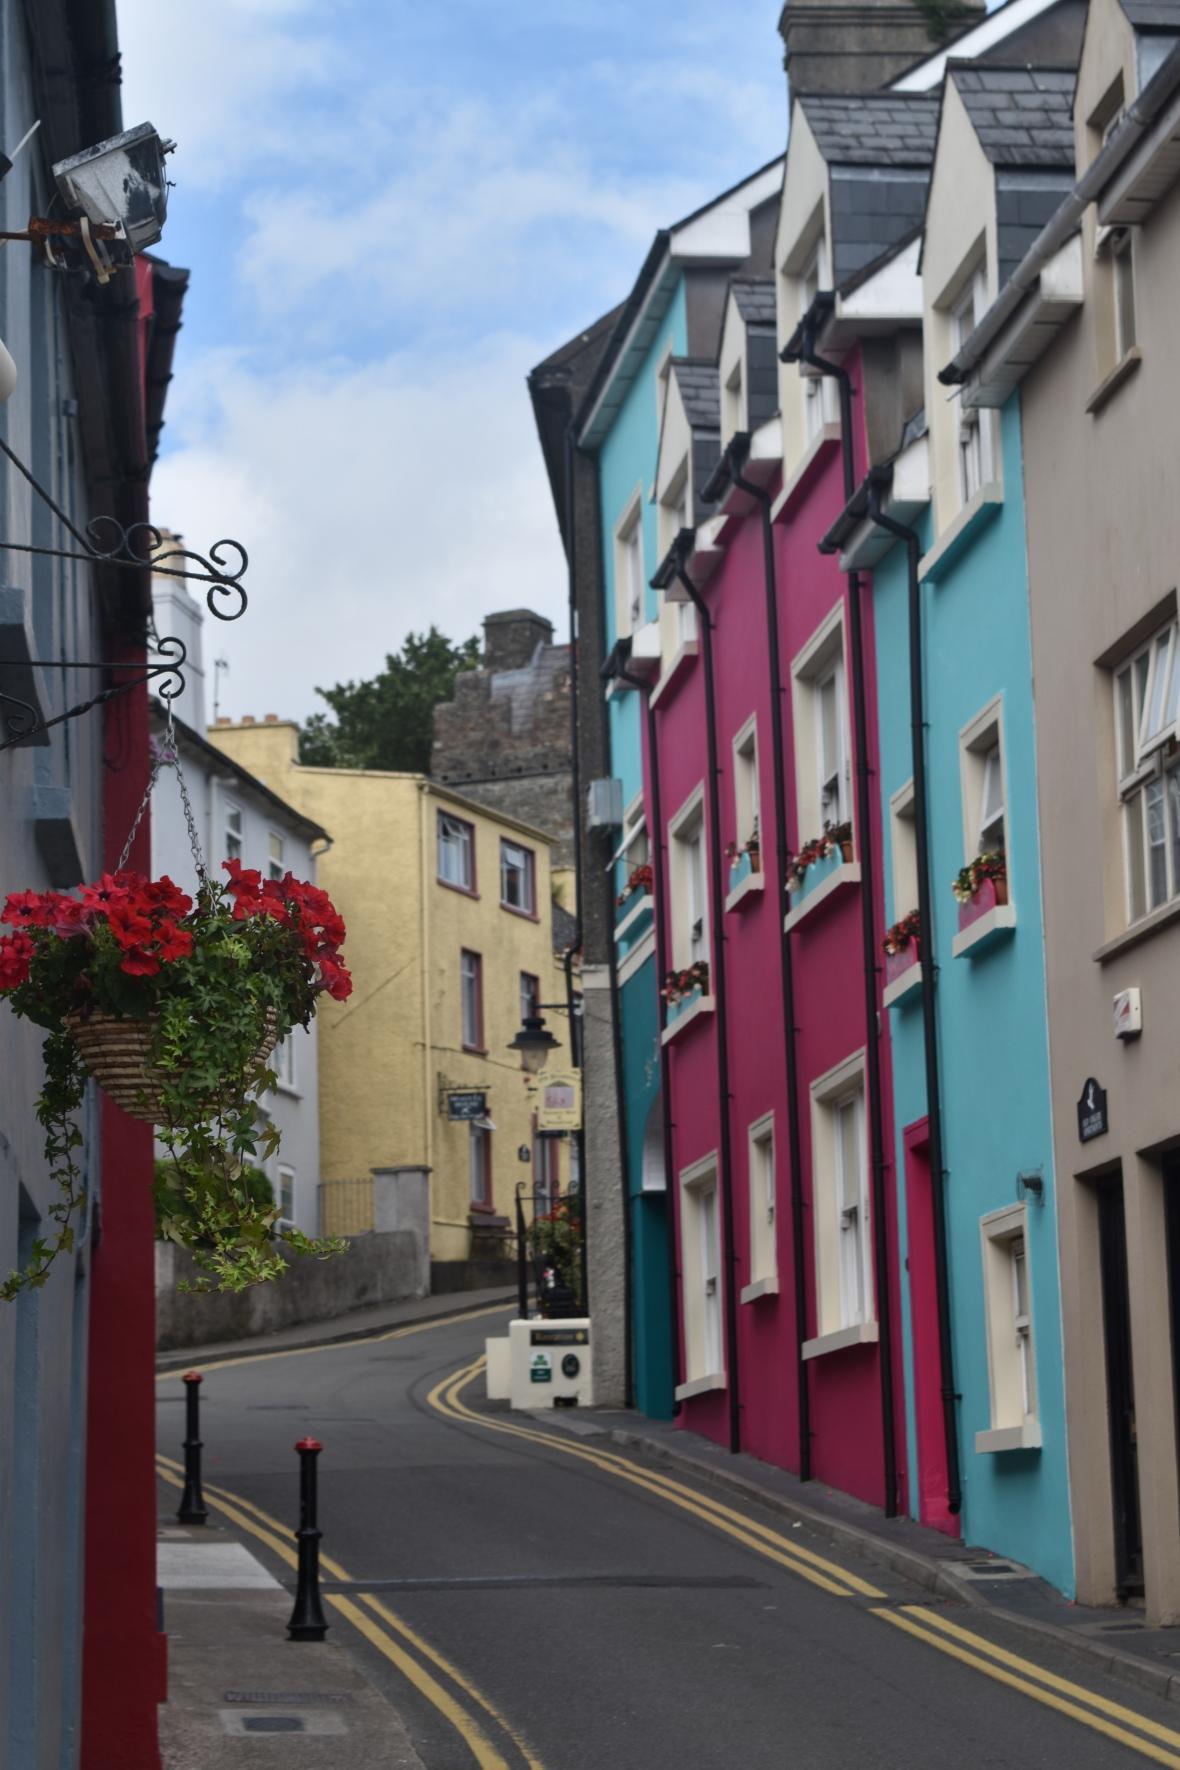 Voyage_Irlande_Ecosse_Juillet2017_TR 301